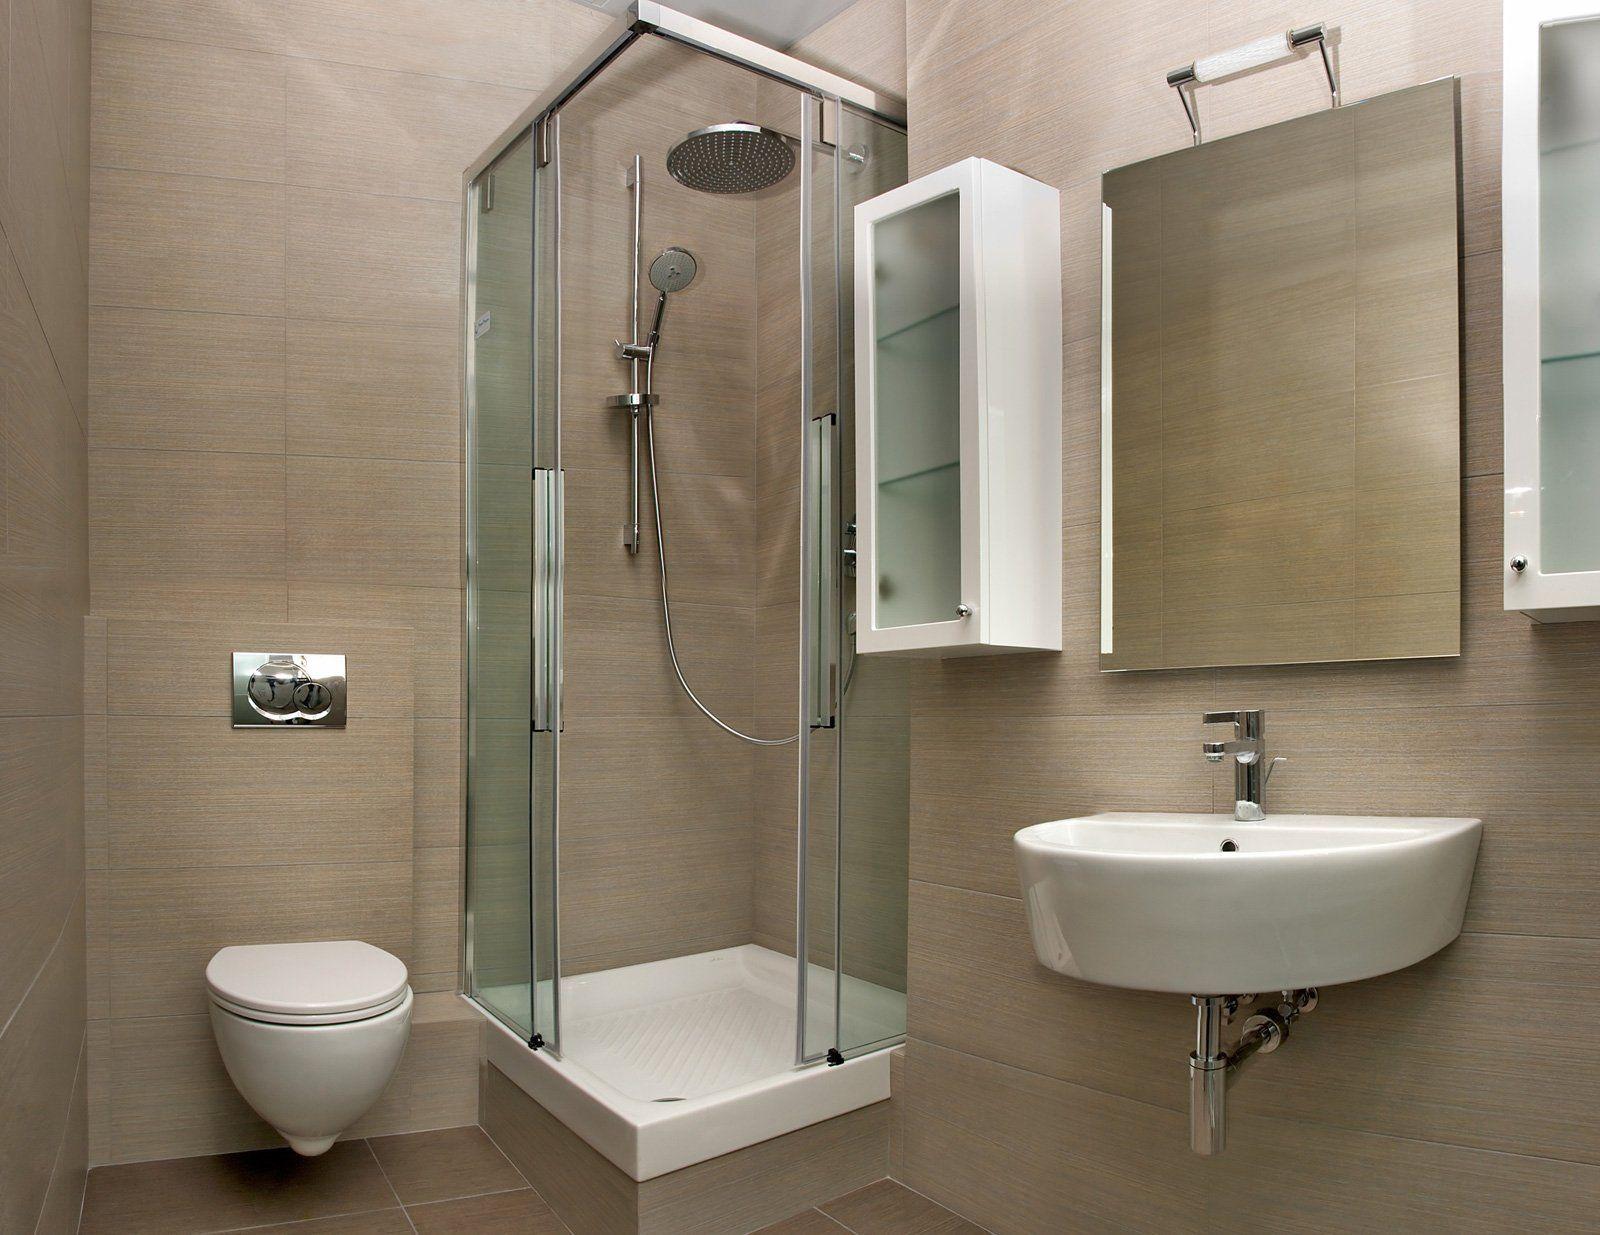 Chic Corner Shower Stalls For Small Space Bathroom Inspiring